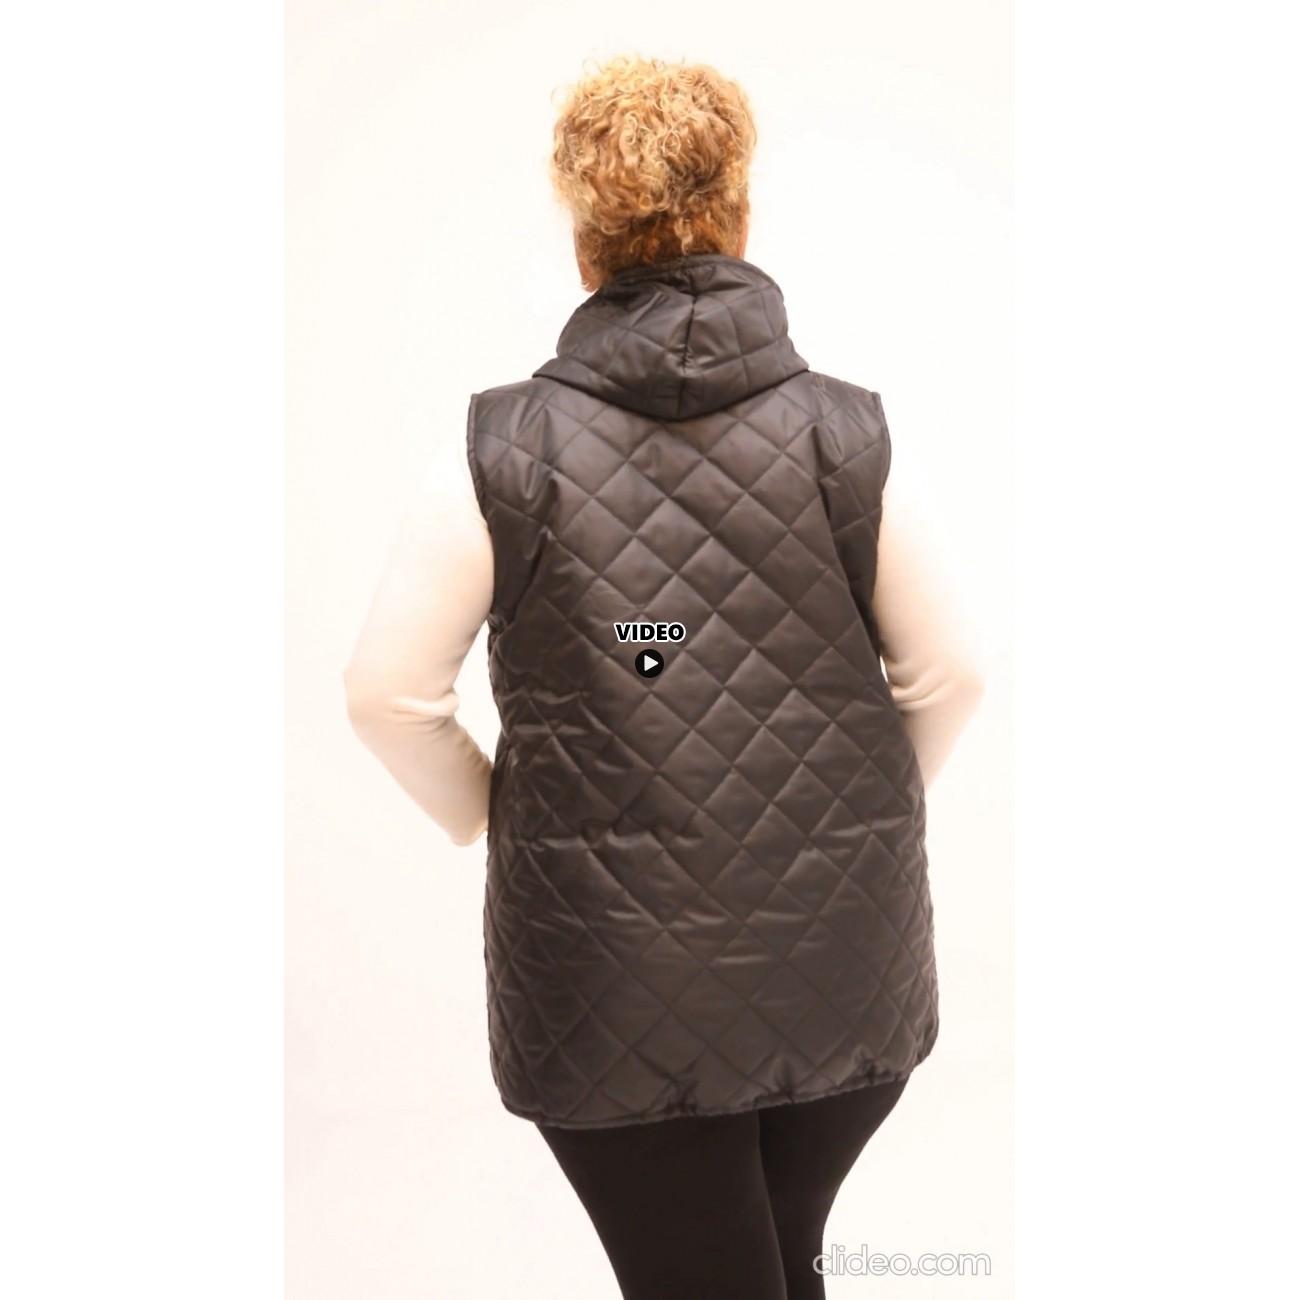 B21-6629A Sleeveless jacket with zipper and hood - Cypress Green